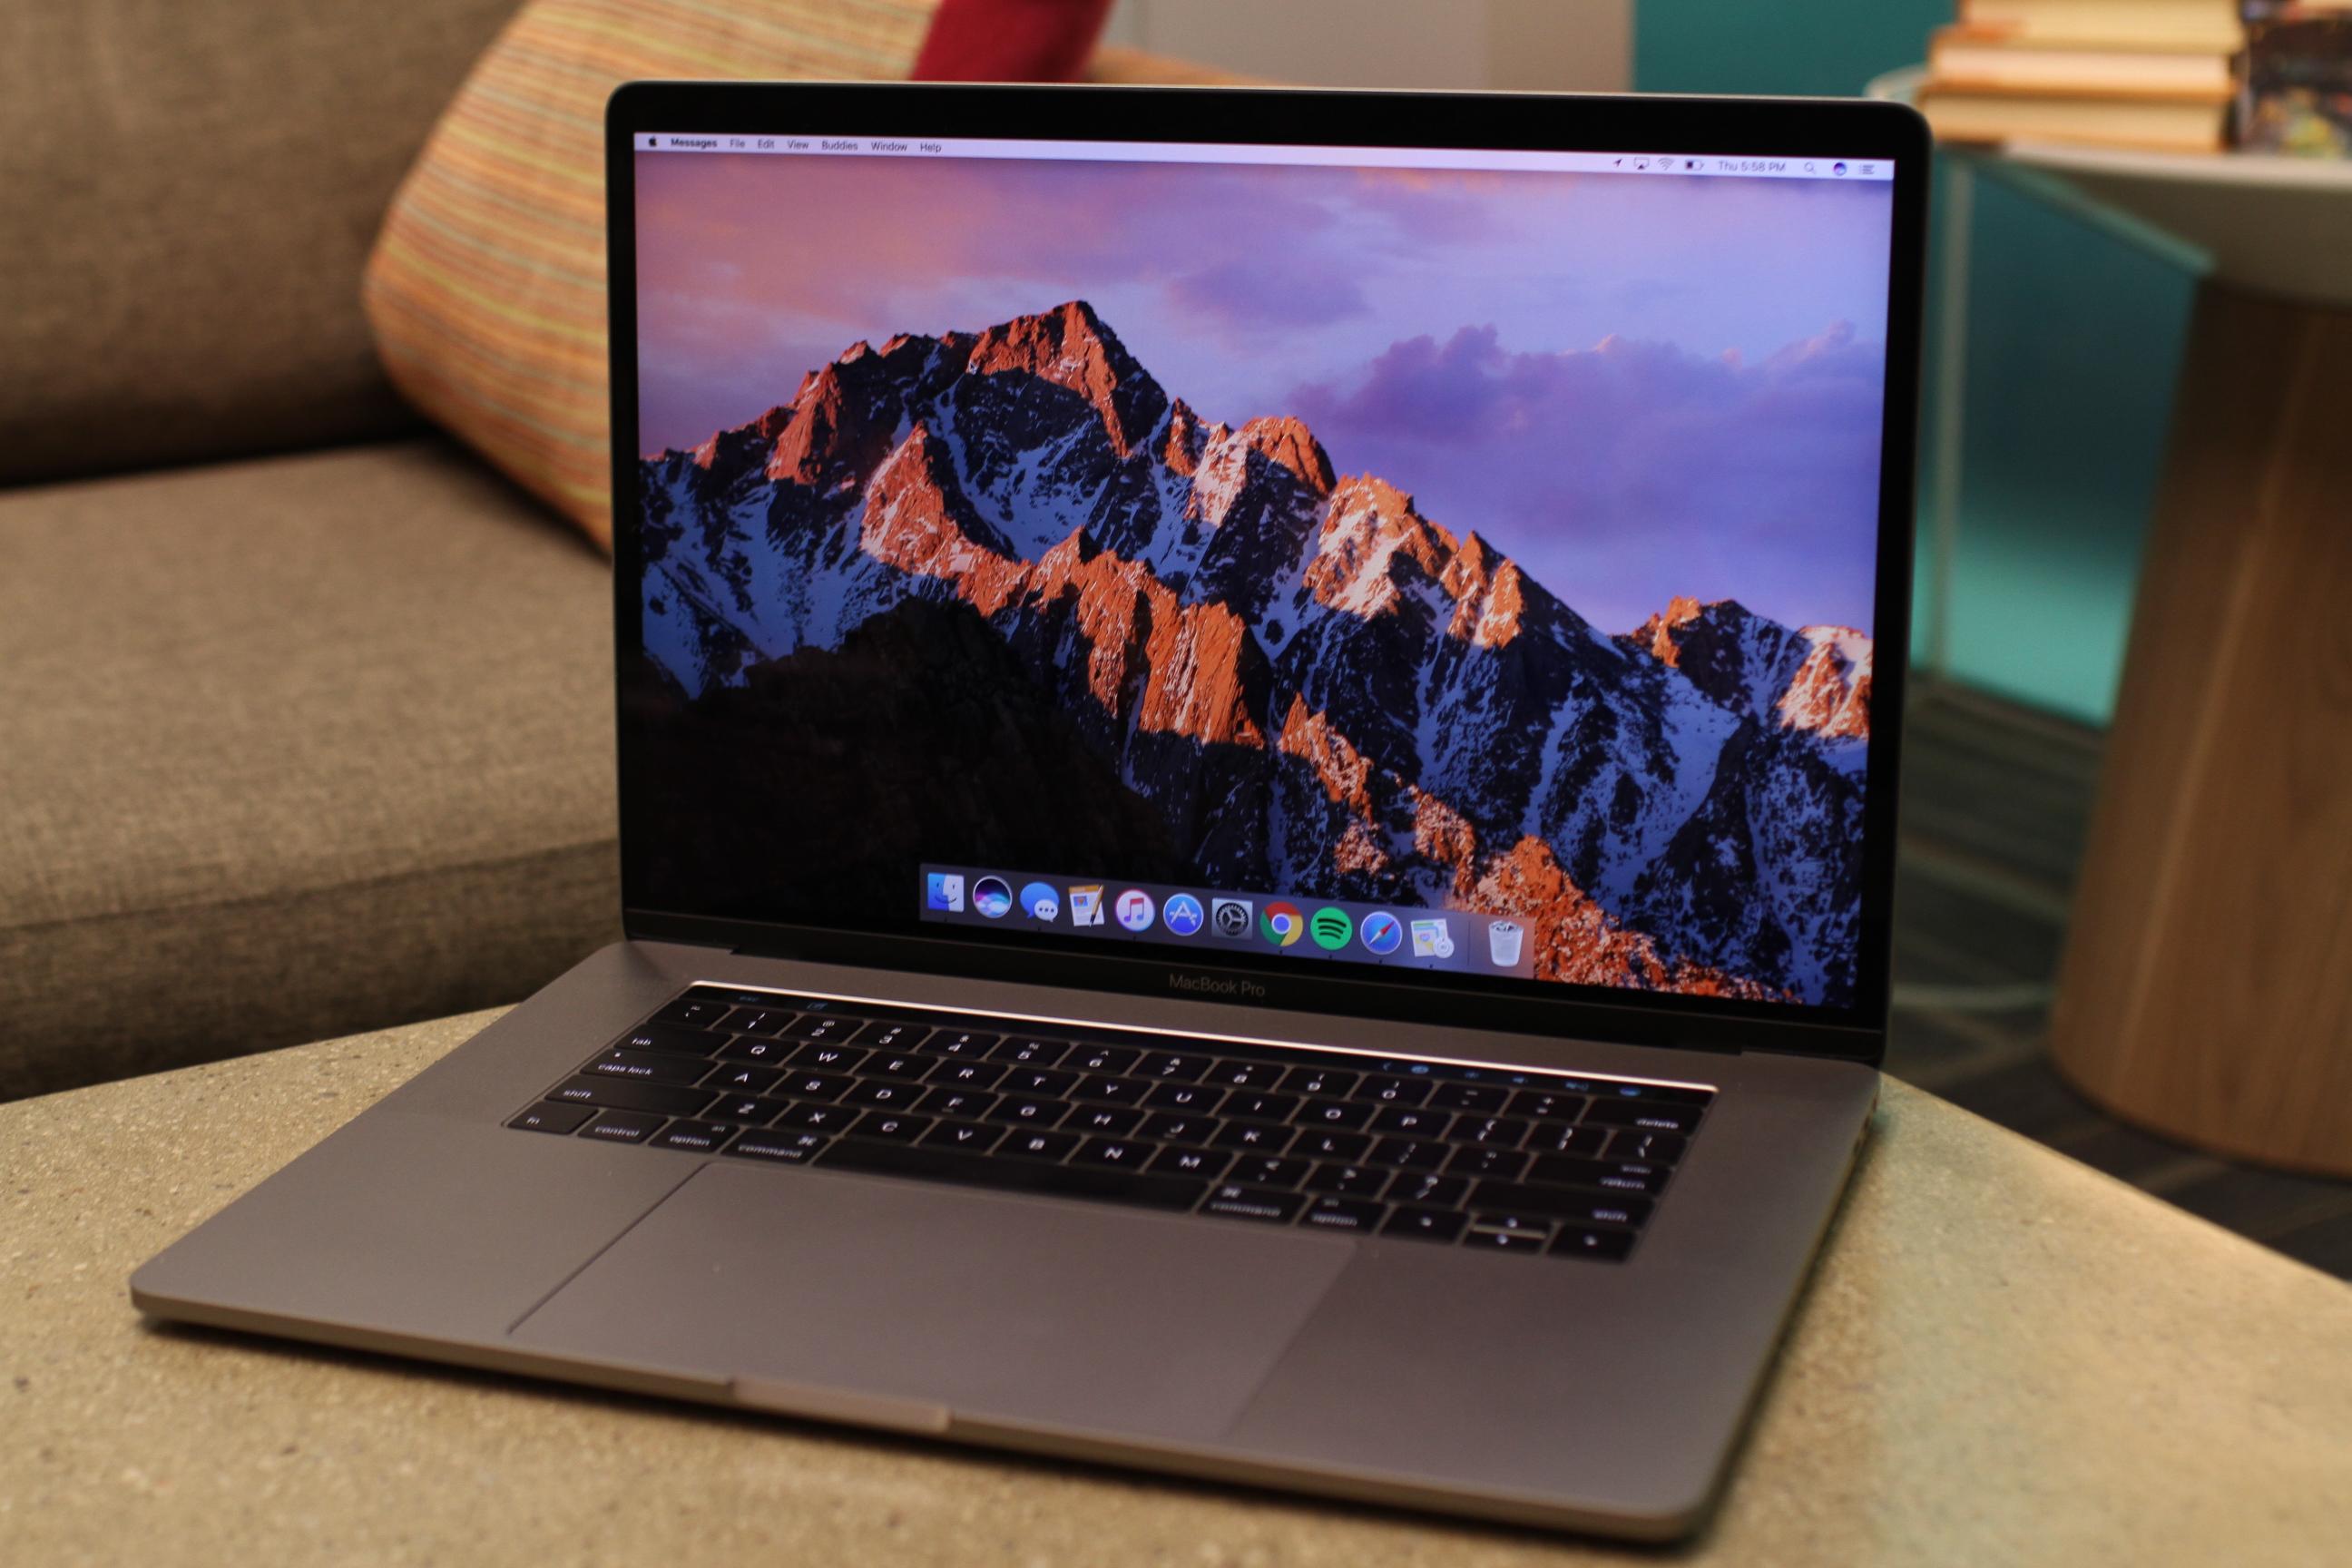 ASIDE IT USB FLASH DRIVE 16GB KEY-SHAPED METAL COMPACT PC MAC BRAND NEW